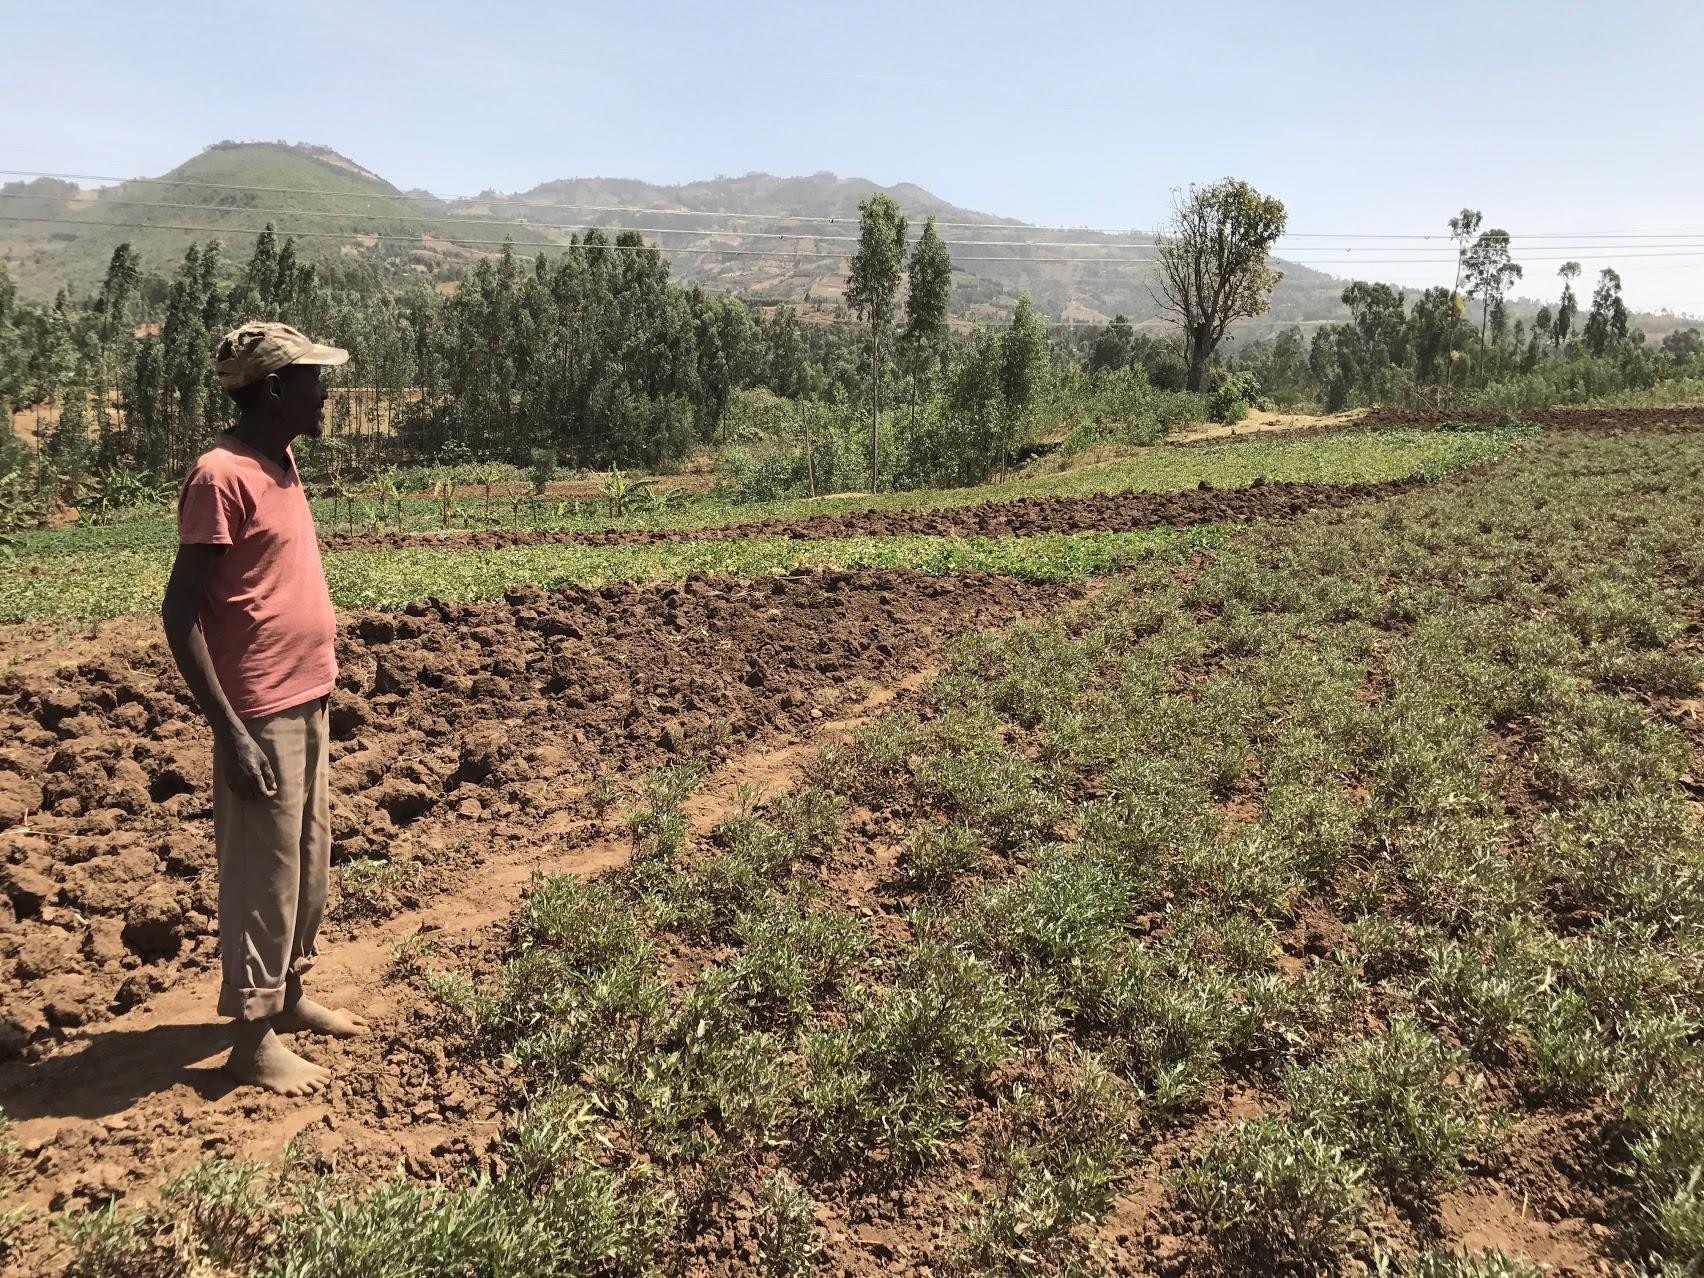 borlaug4 farmer in Ethiopia.JPG thumbnail